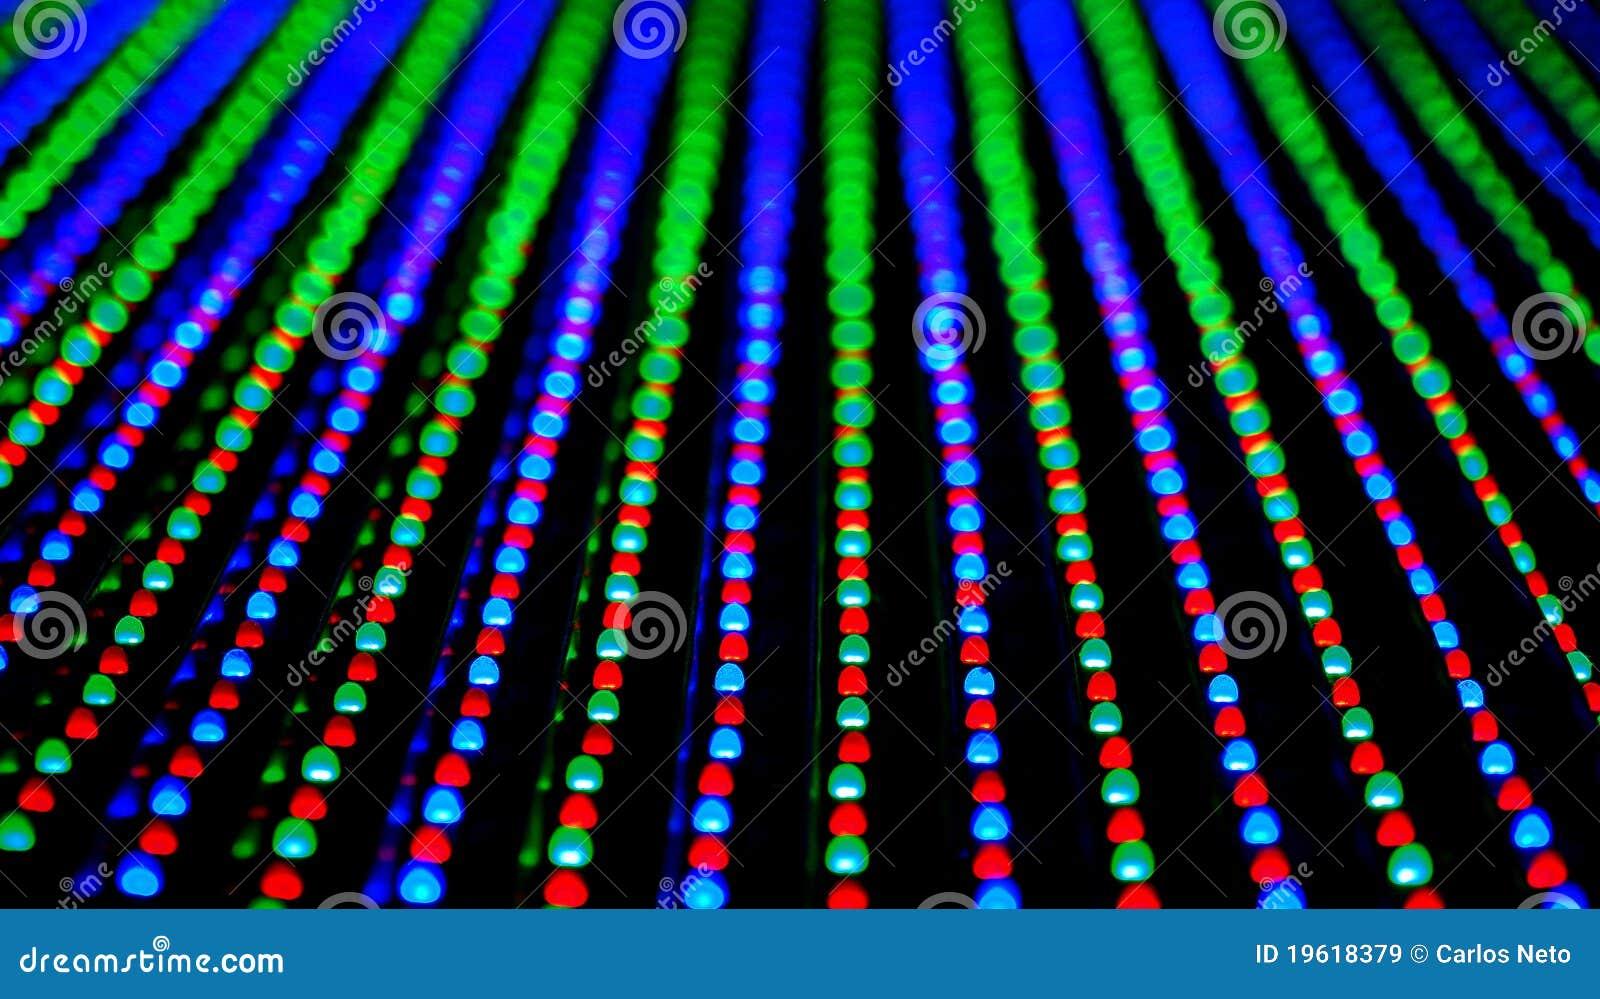 led screen panel texture stock image image of effect 19618379. Black Bedroom Furniture Sets. Home Design Ideas